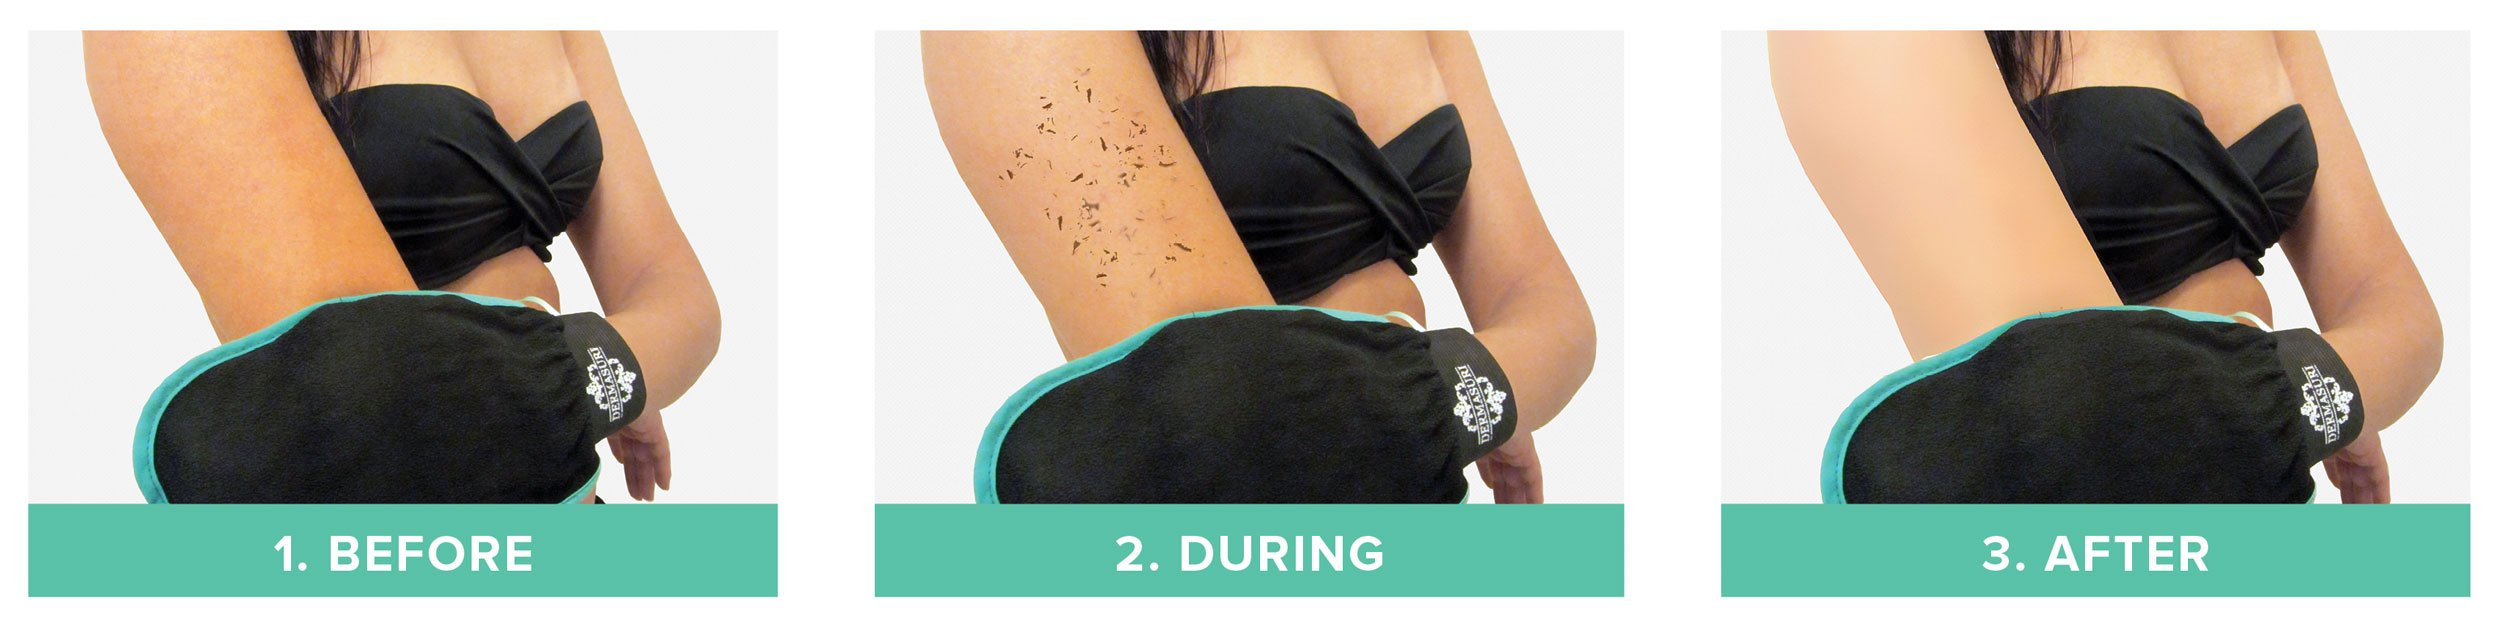 Dermasuri Deep Exfoliating Mitt Body Scrub by Dermasuri, Inc.